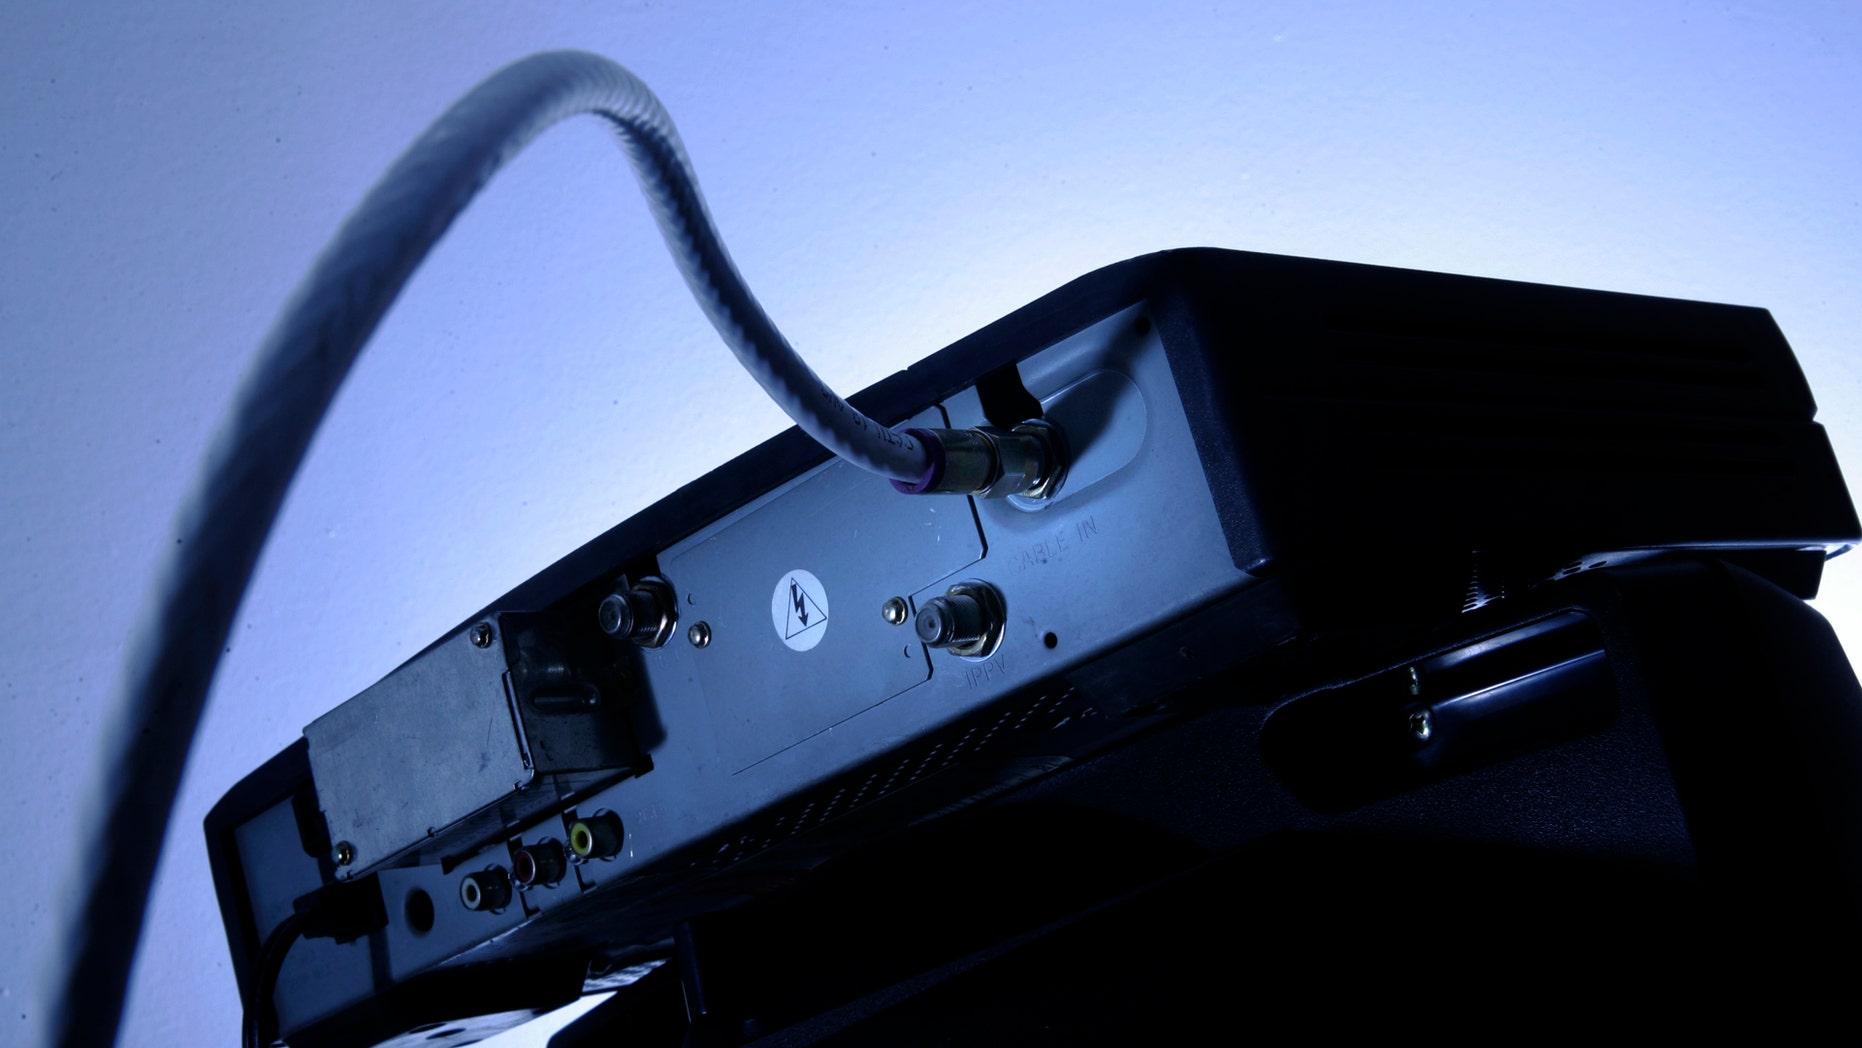 Admit it, you've suspicion about slicing a cord. (AP Photo/Matt Rourke, File)